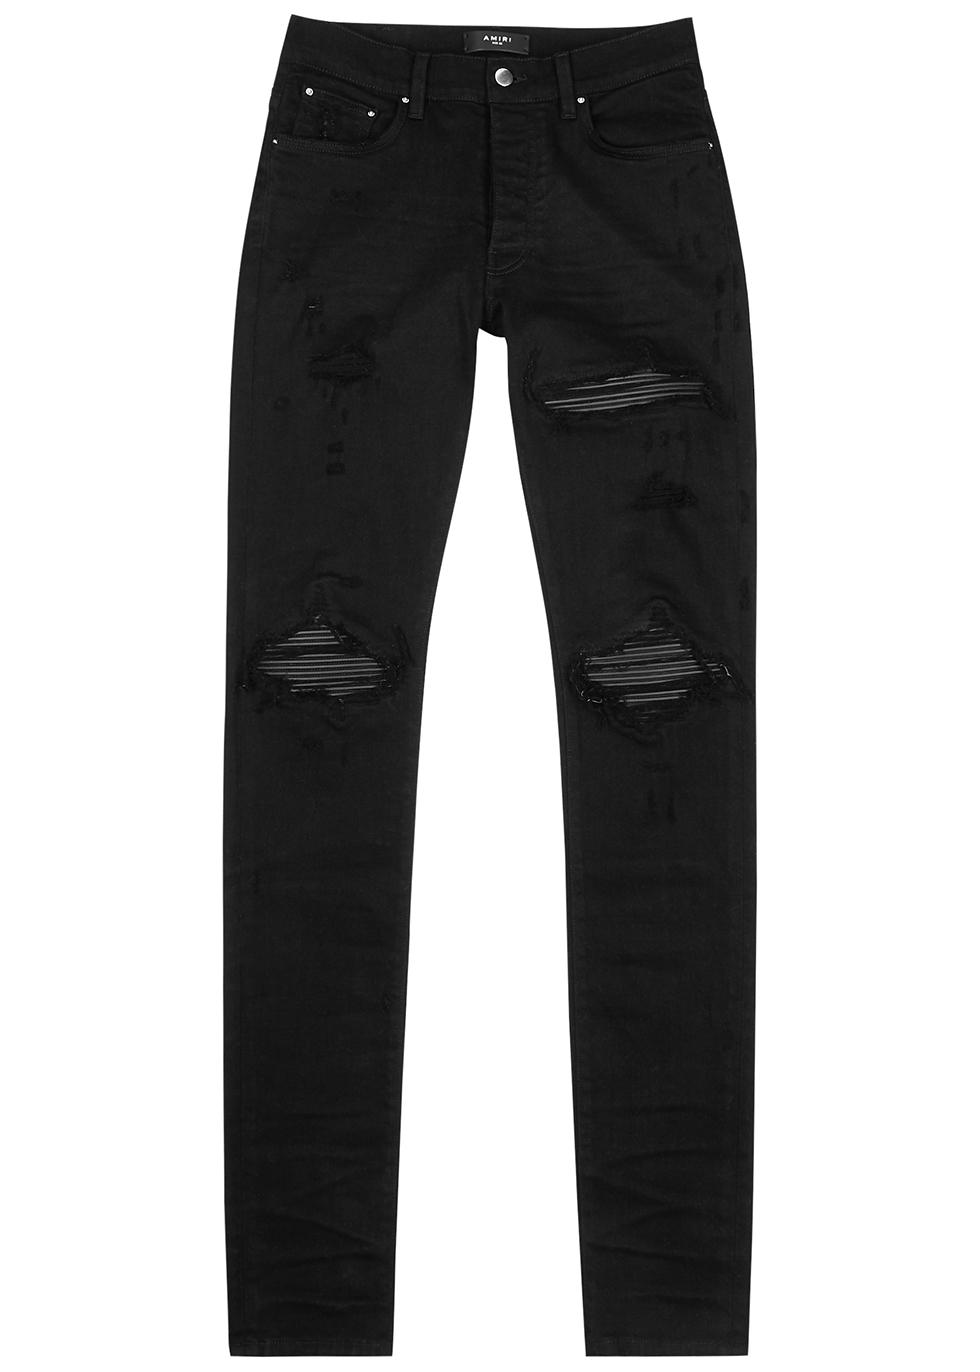 MX1 black distressed skinny jeans